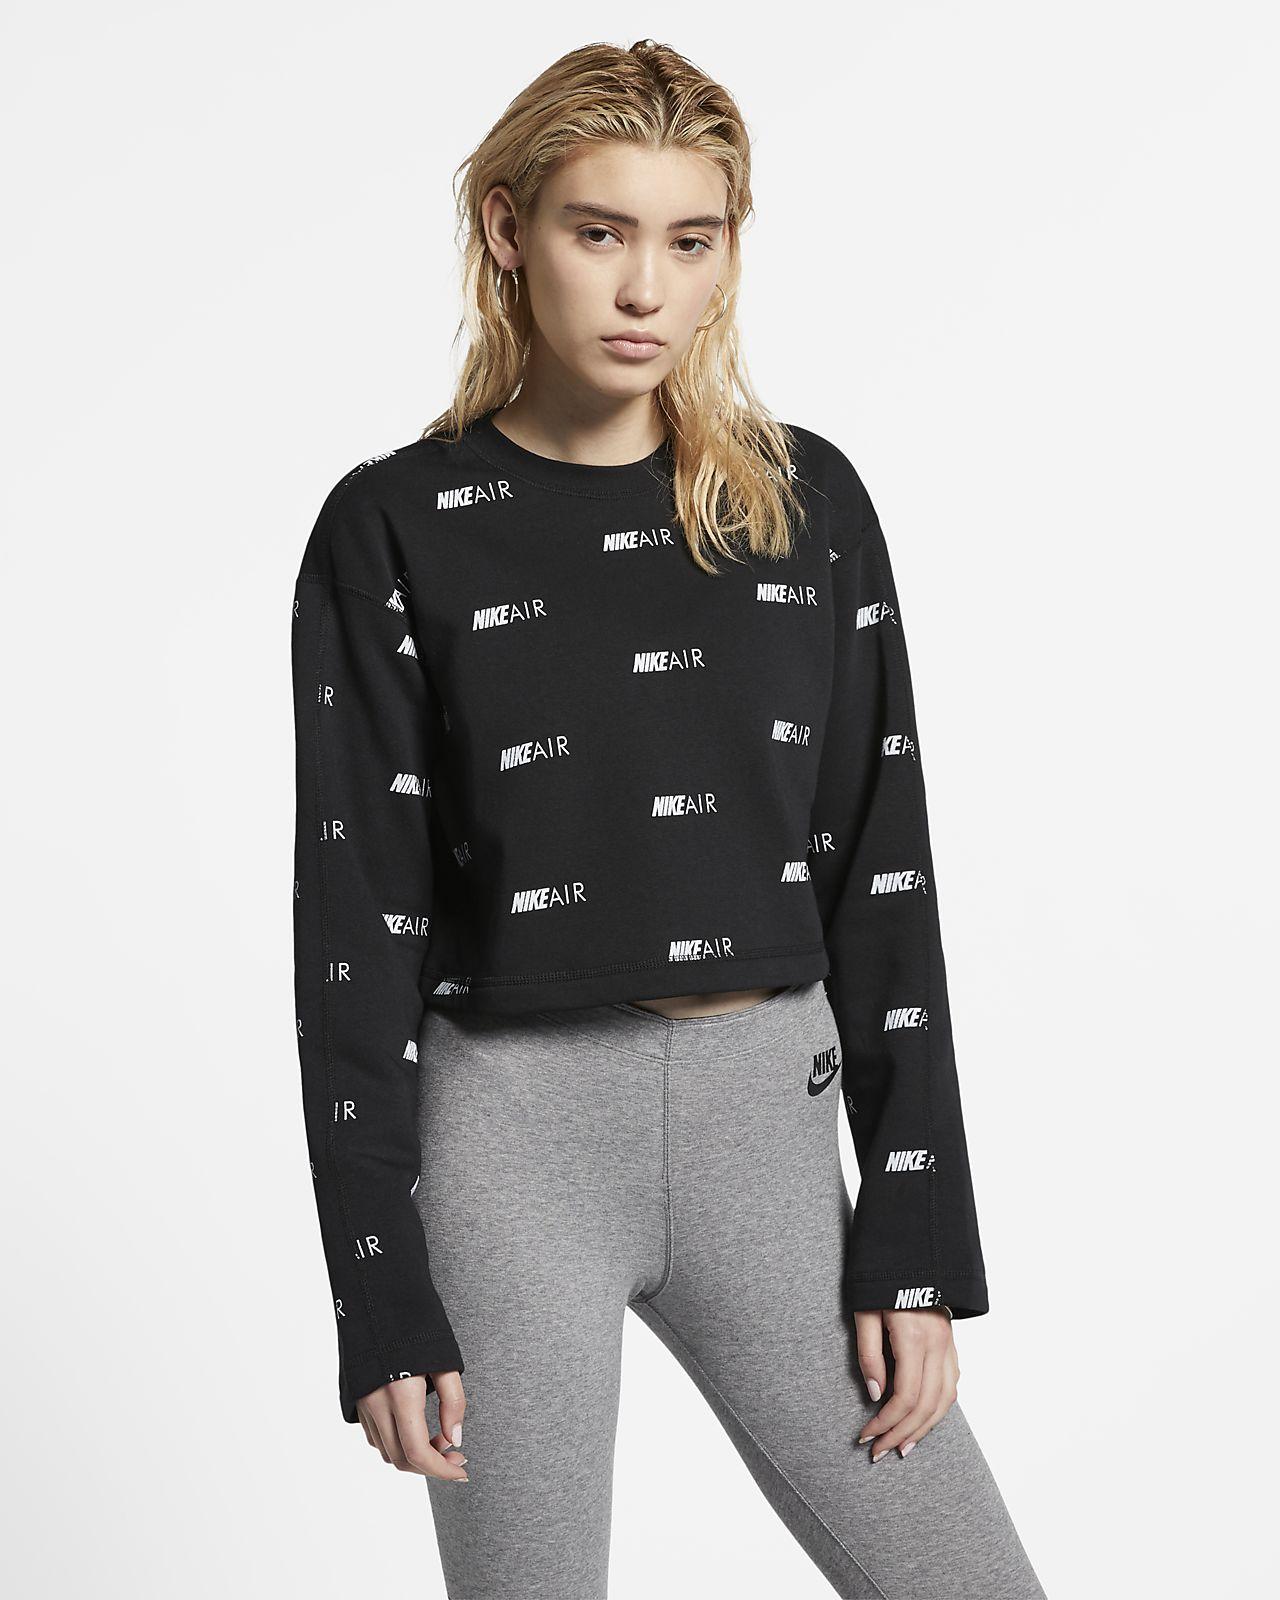 Nike Sportswear Women's Printed Crew